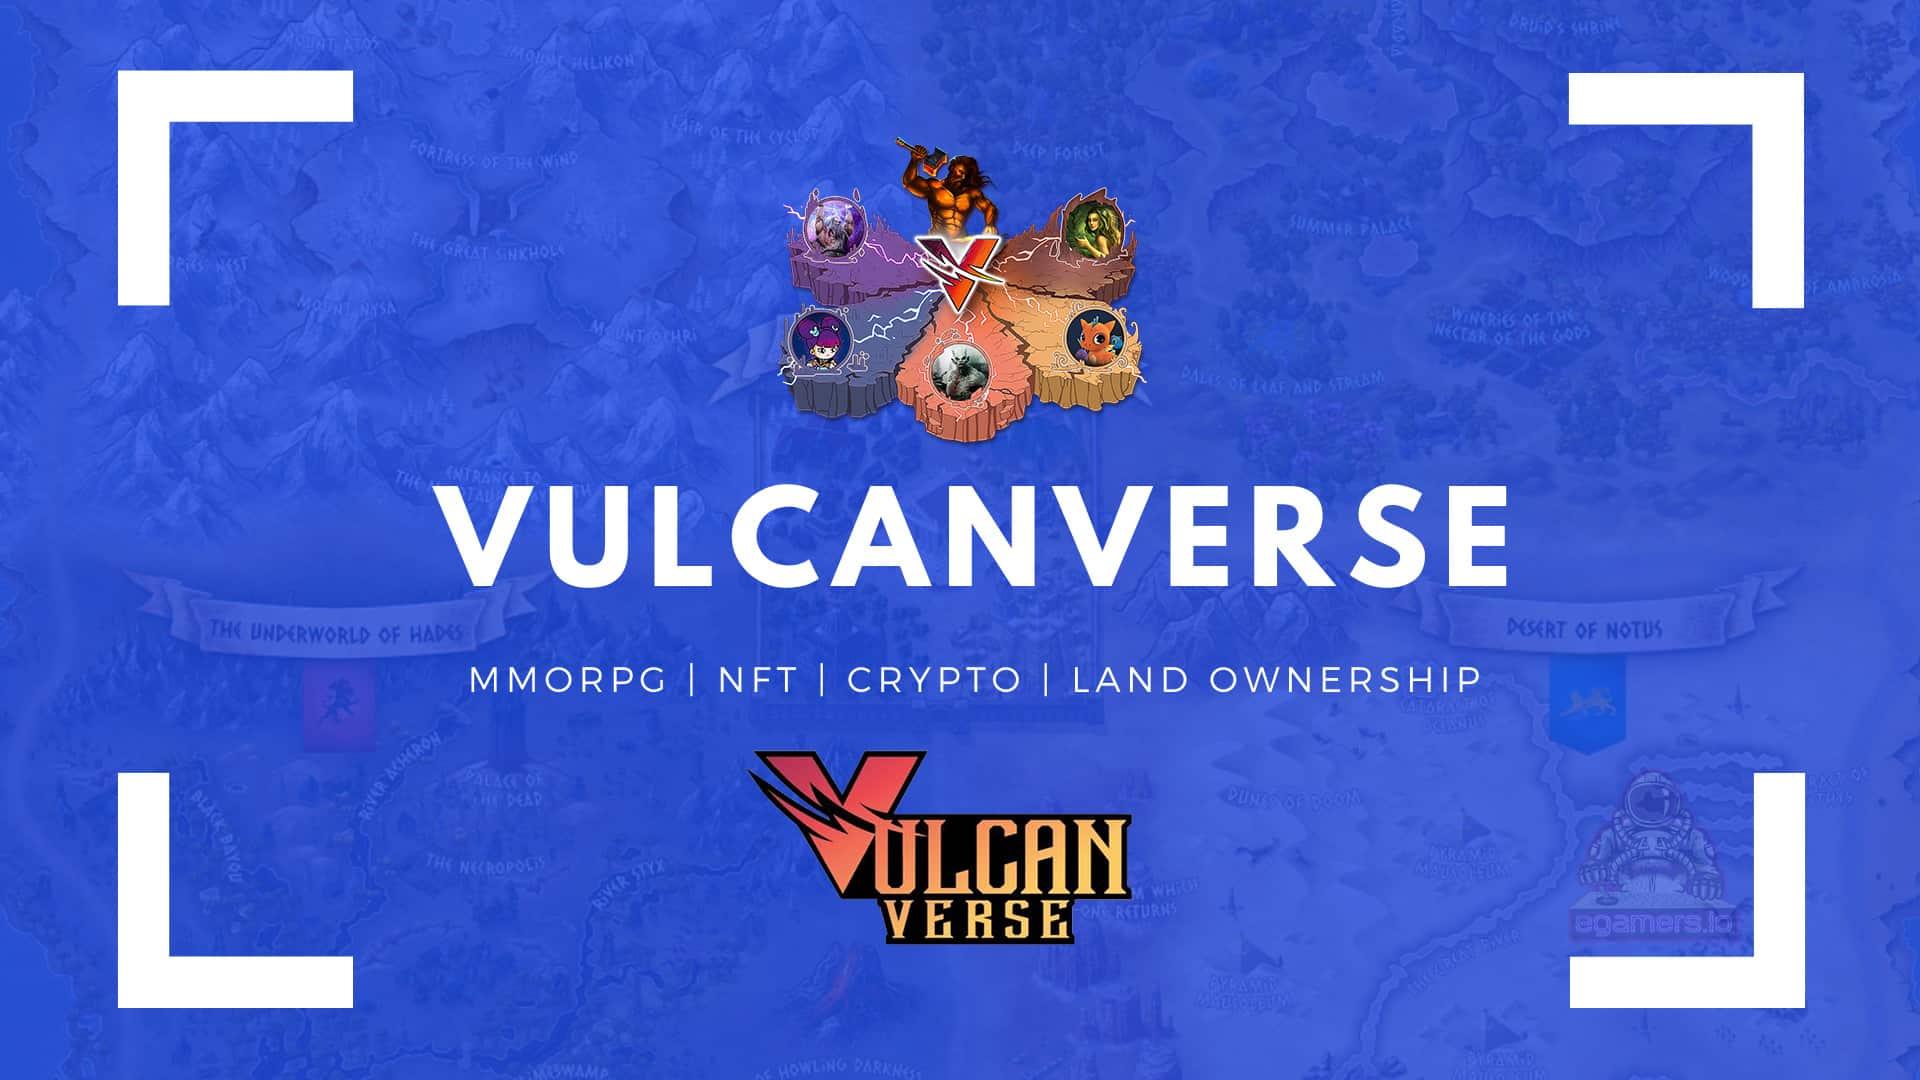 Vulcanverse MMORPG NFT Crypto Game.